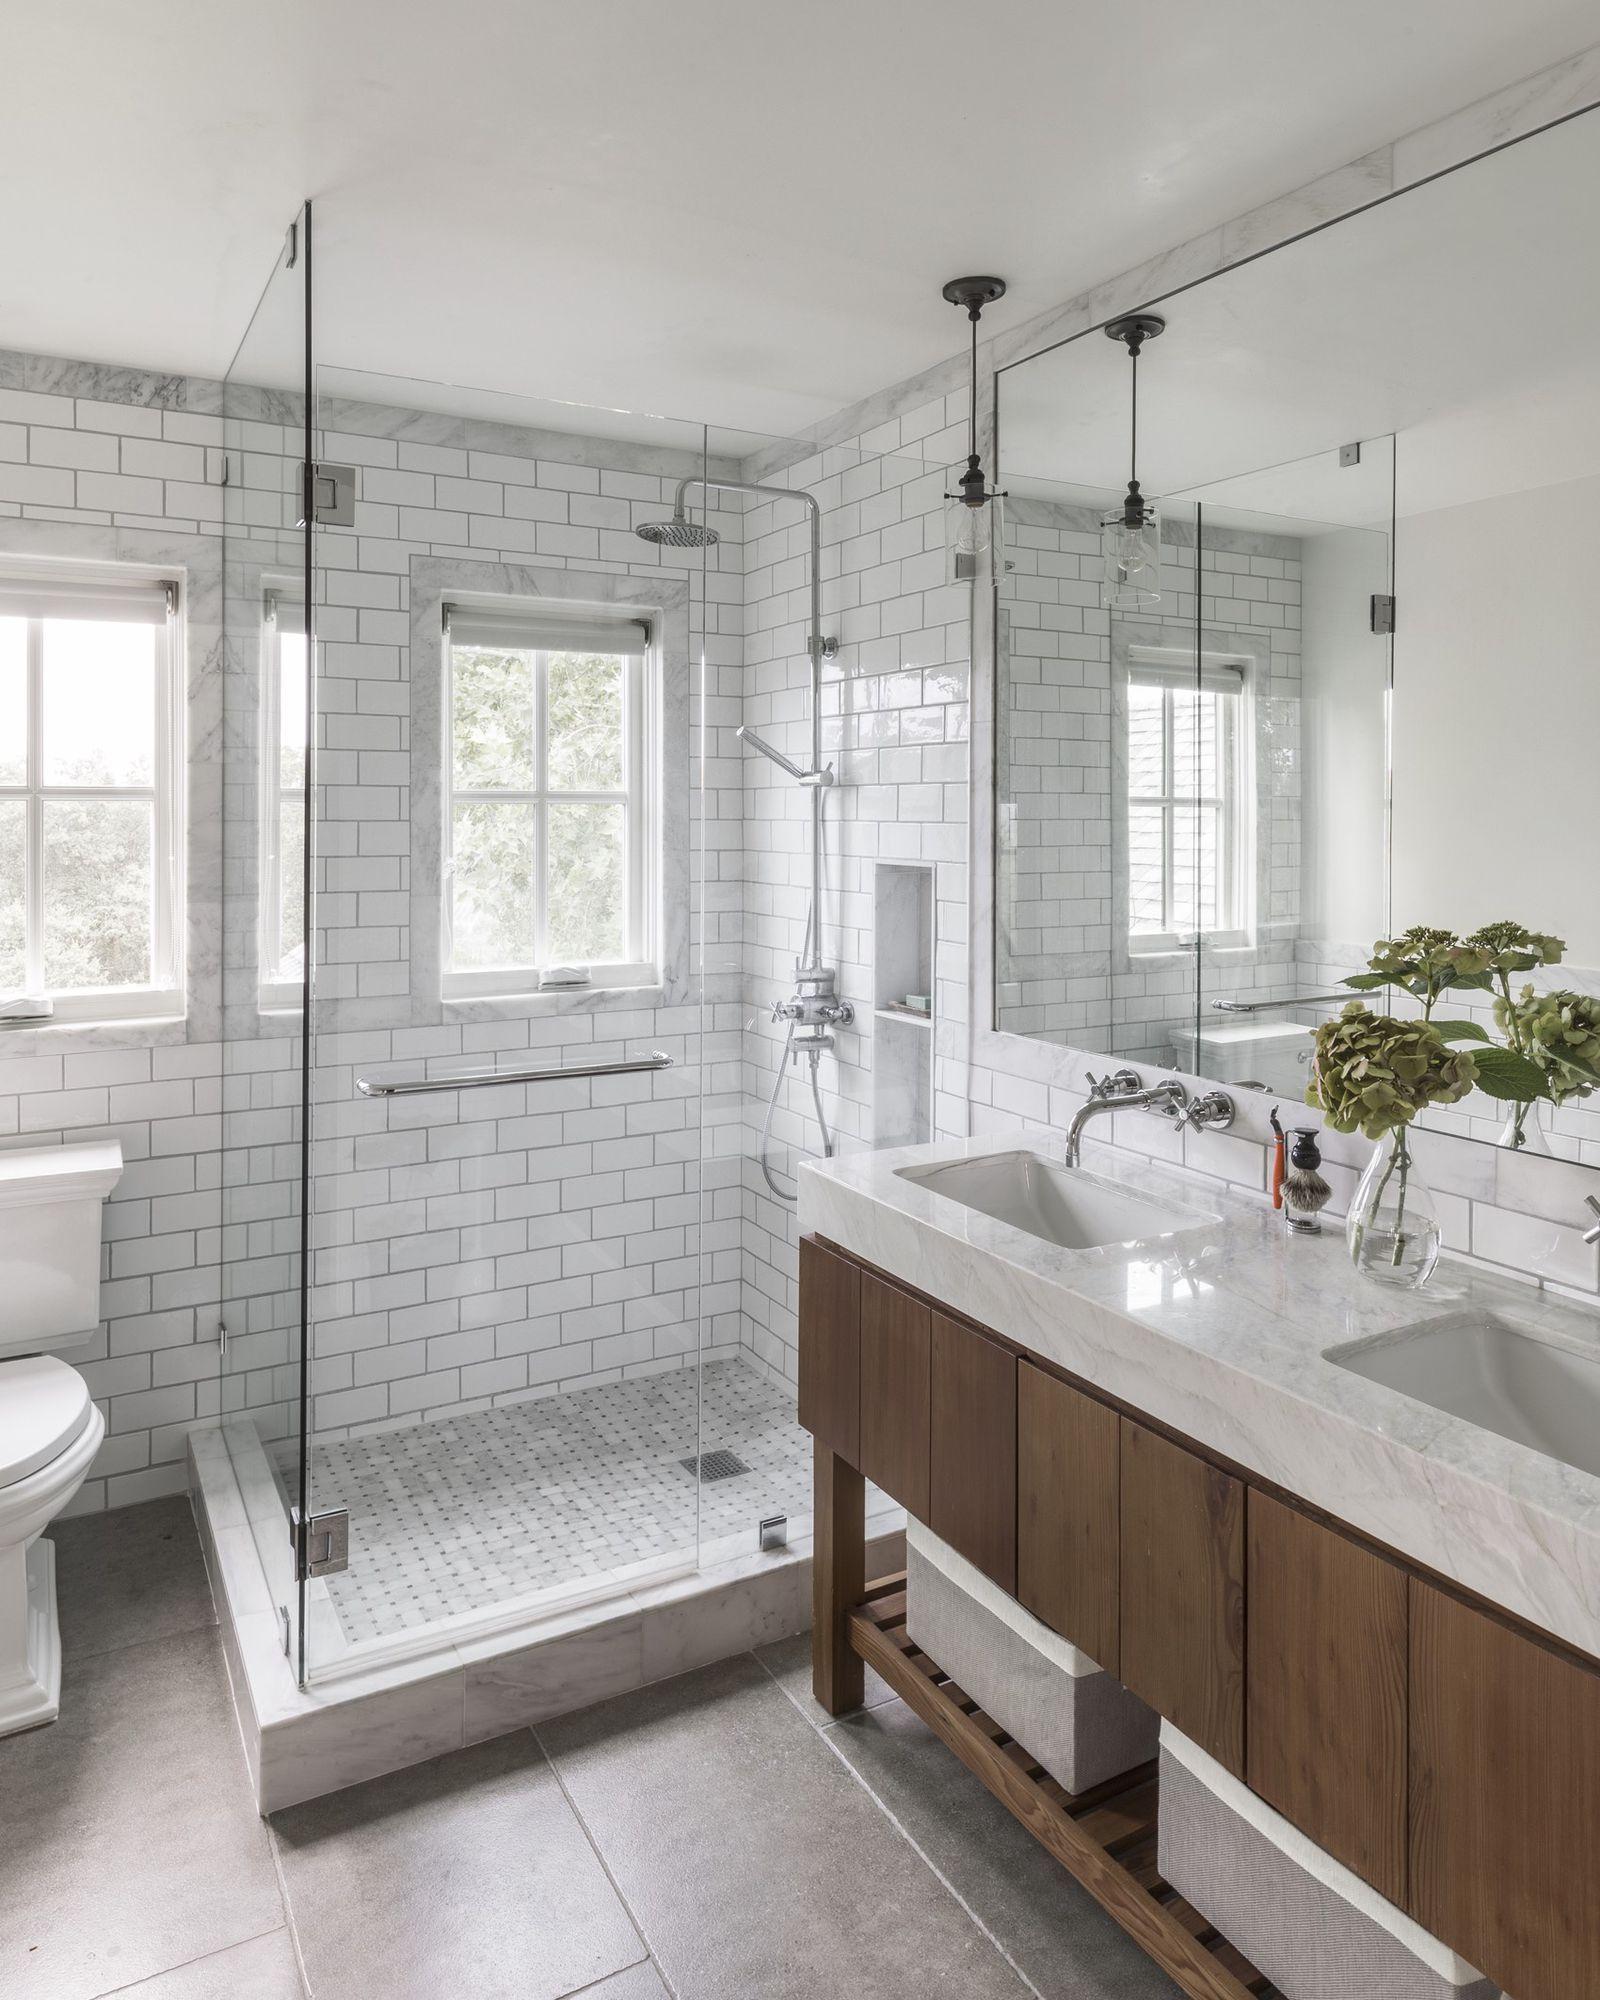 These Walk In Shower Ideas Will Help You Find Your Zen Bathroom Shower Design Bathrooms Remodel Bathroom Renovations